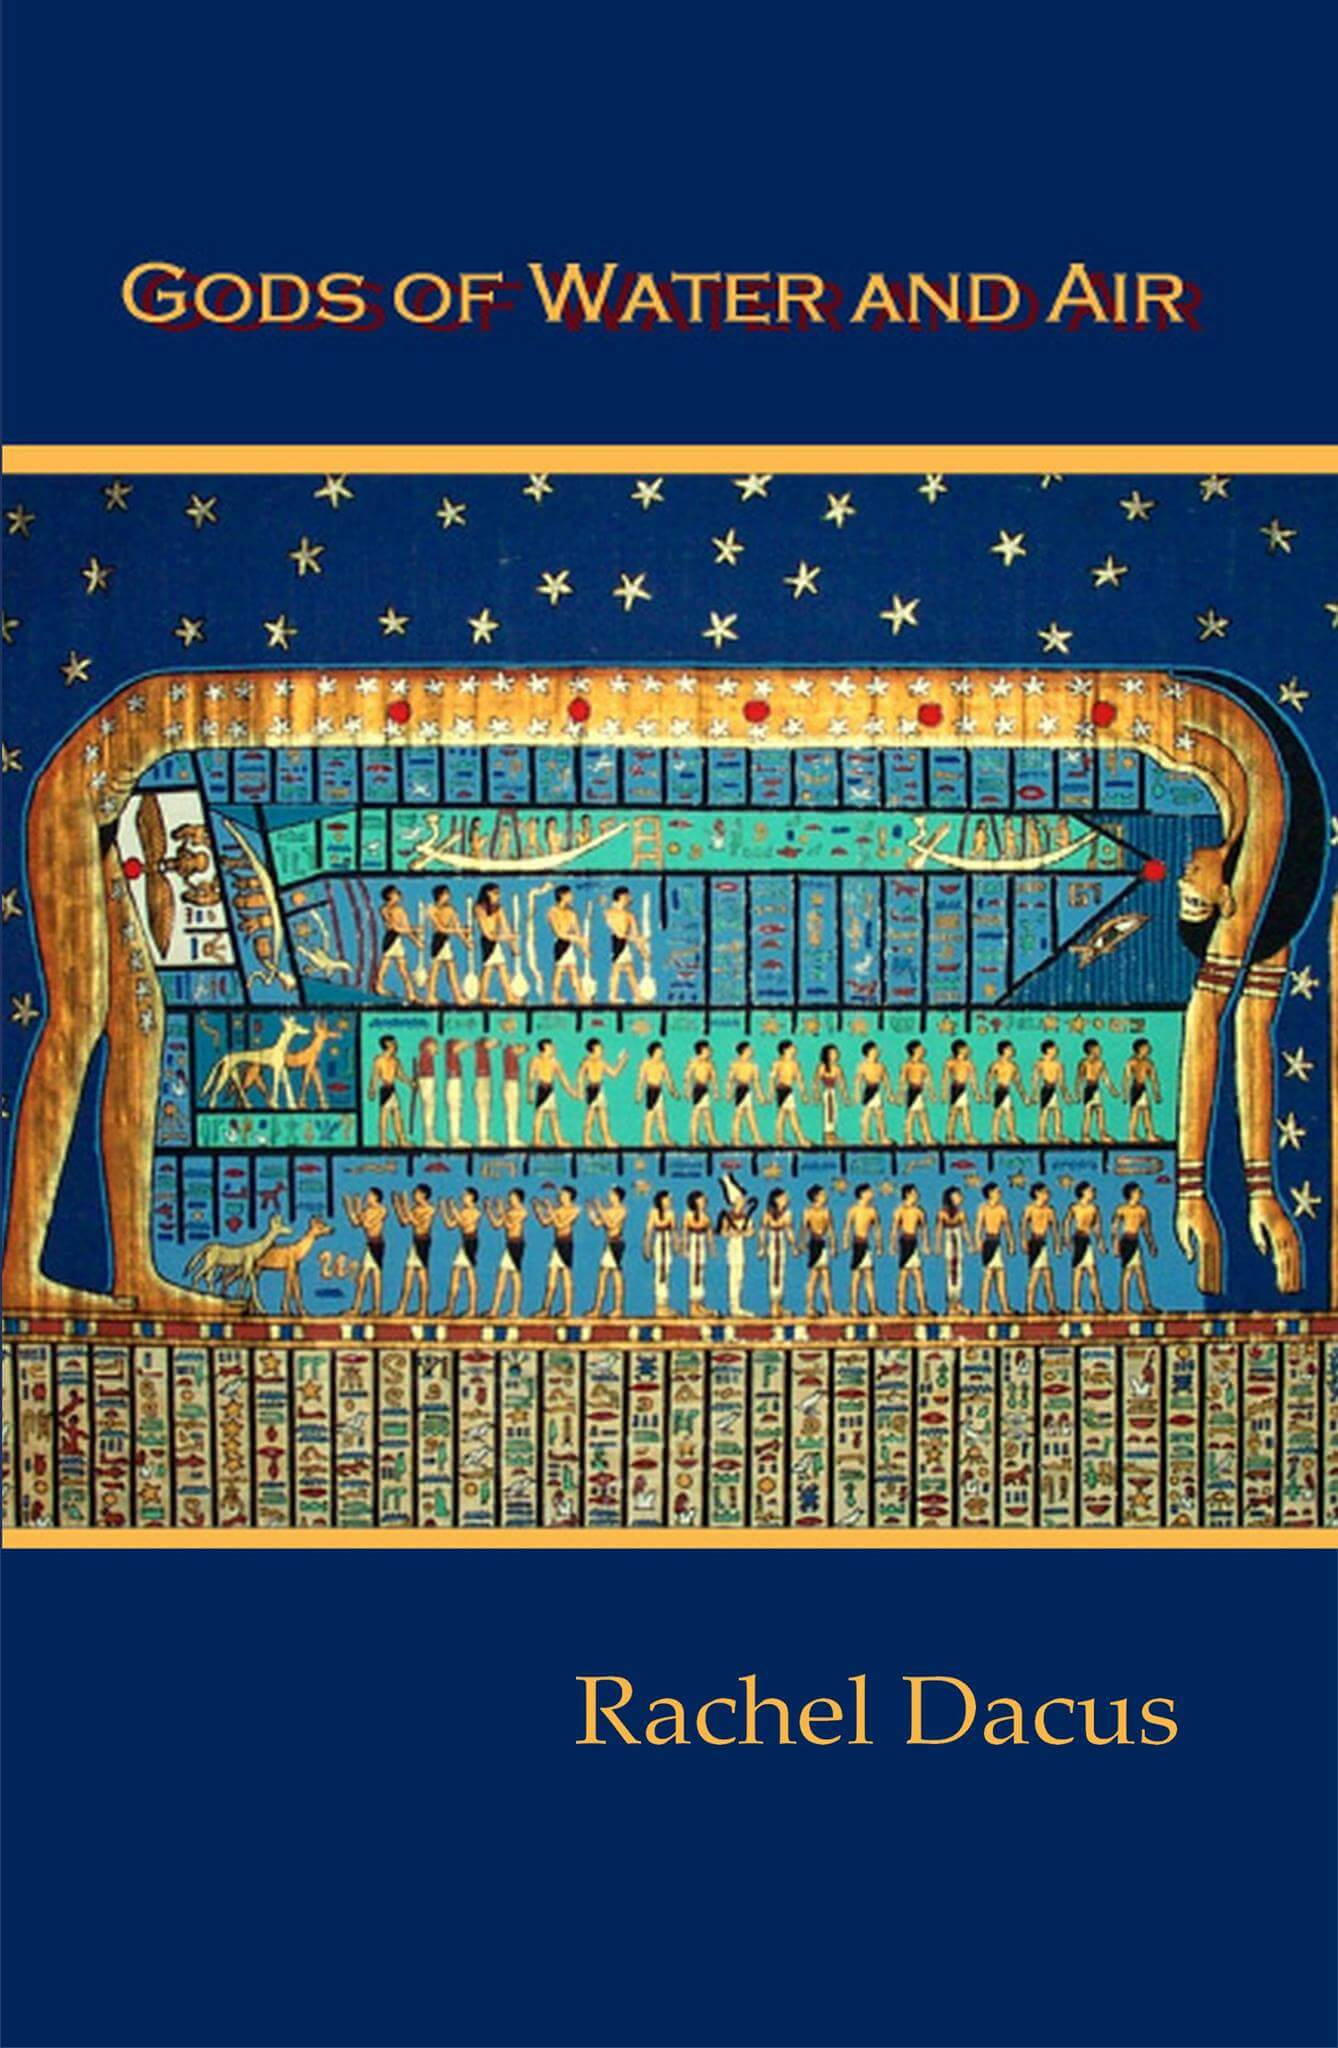 Gods of Water and Air - Rachel Dacus - poetry book